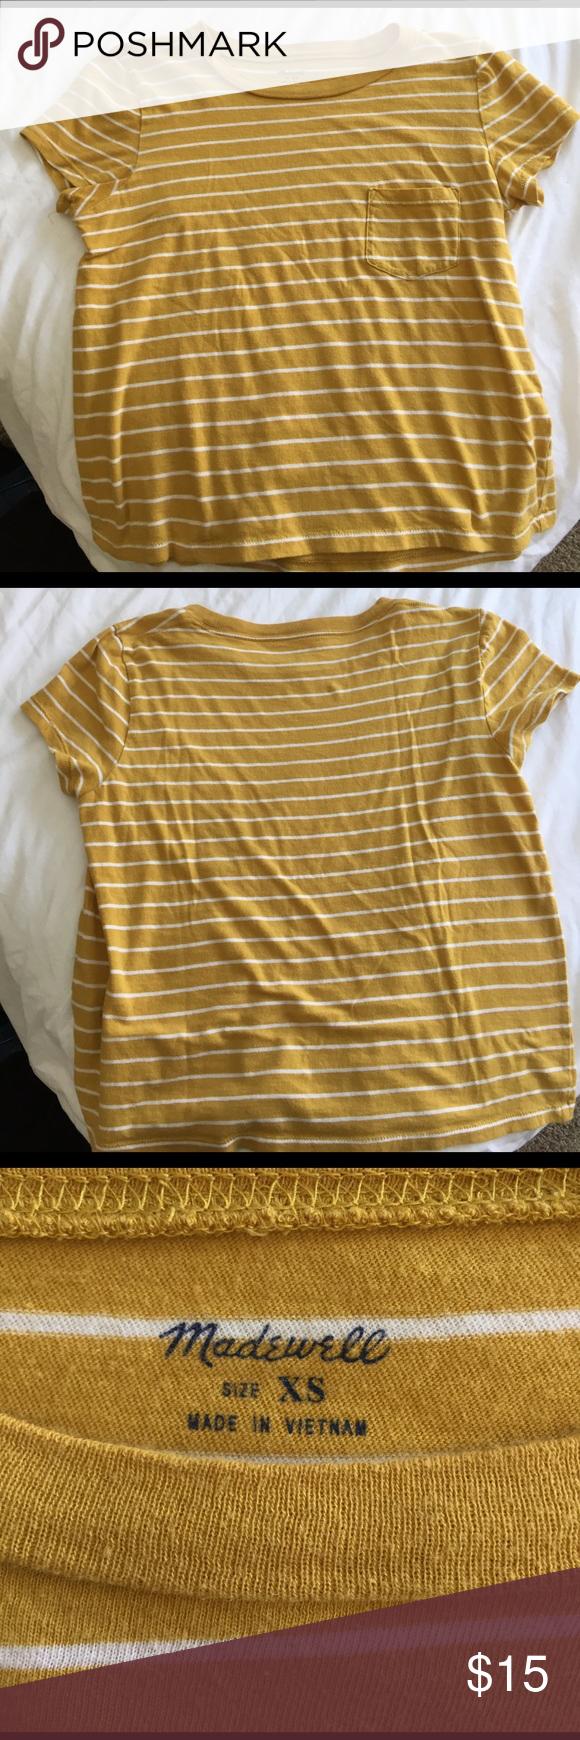 Madewell Ranger Tee Super cute mustard yellow strip crop top. Great minimalist look with jeans! Madewell Tops Crop Tops